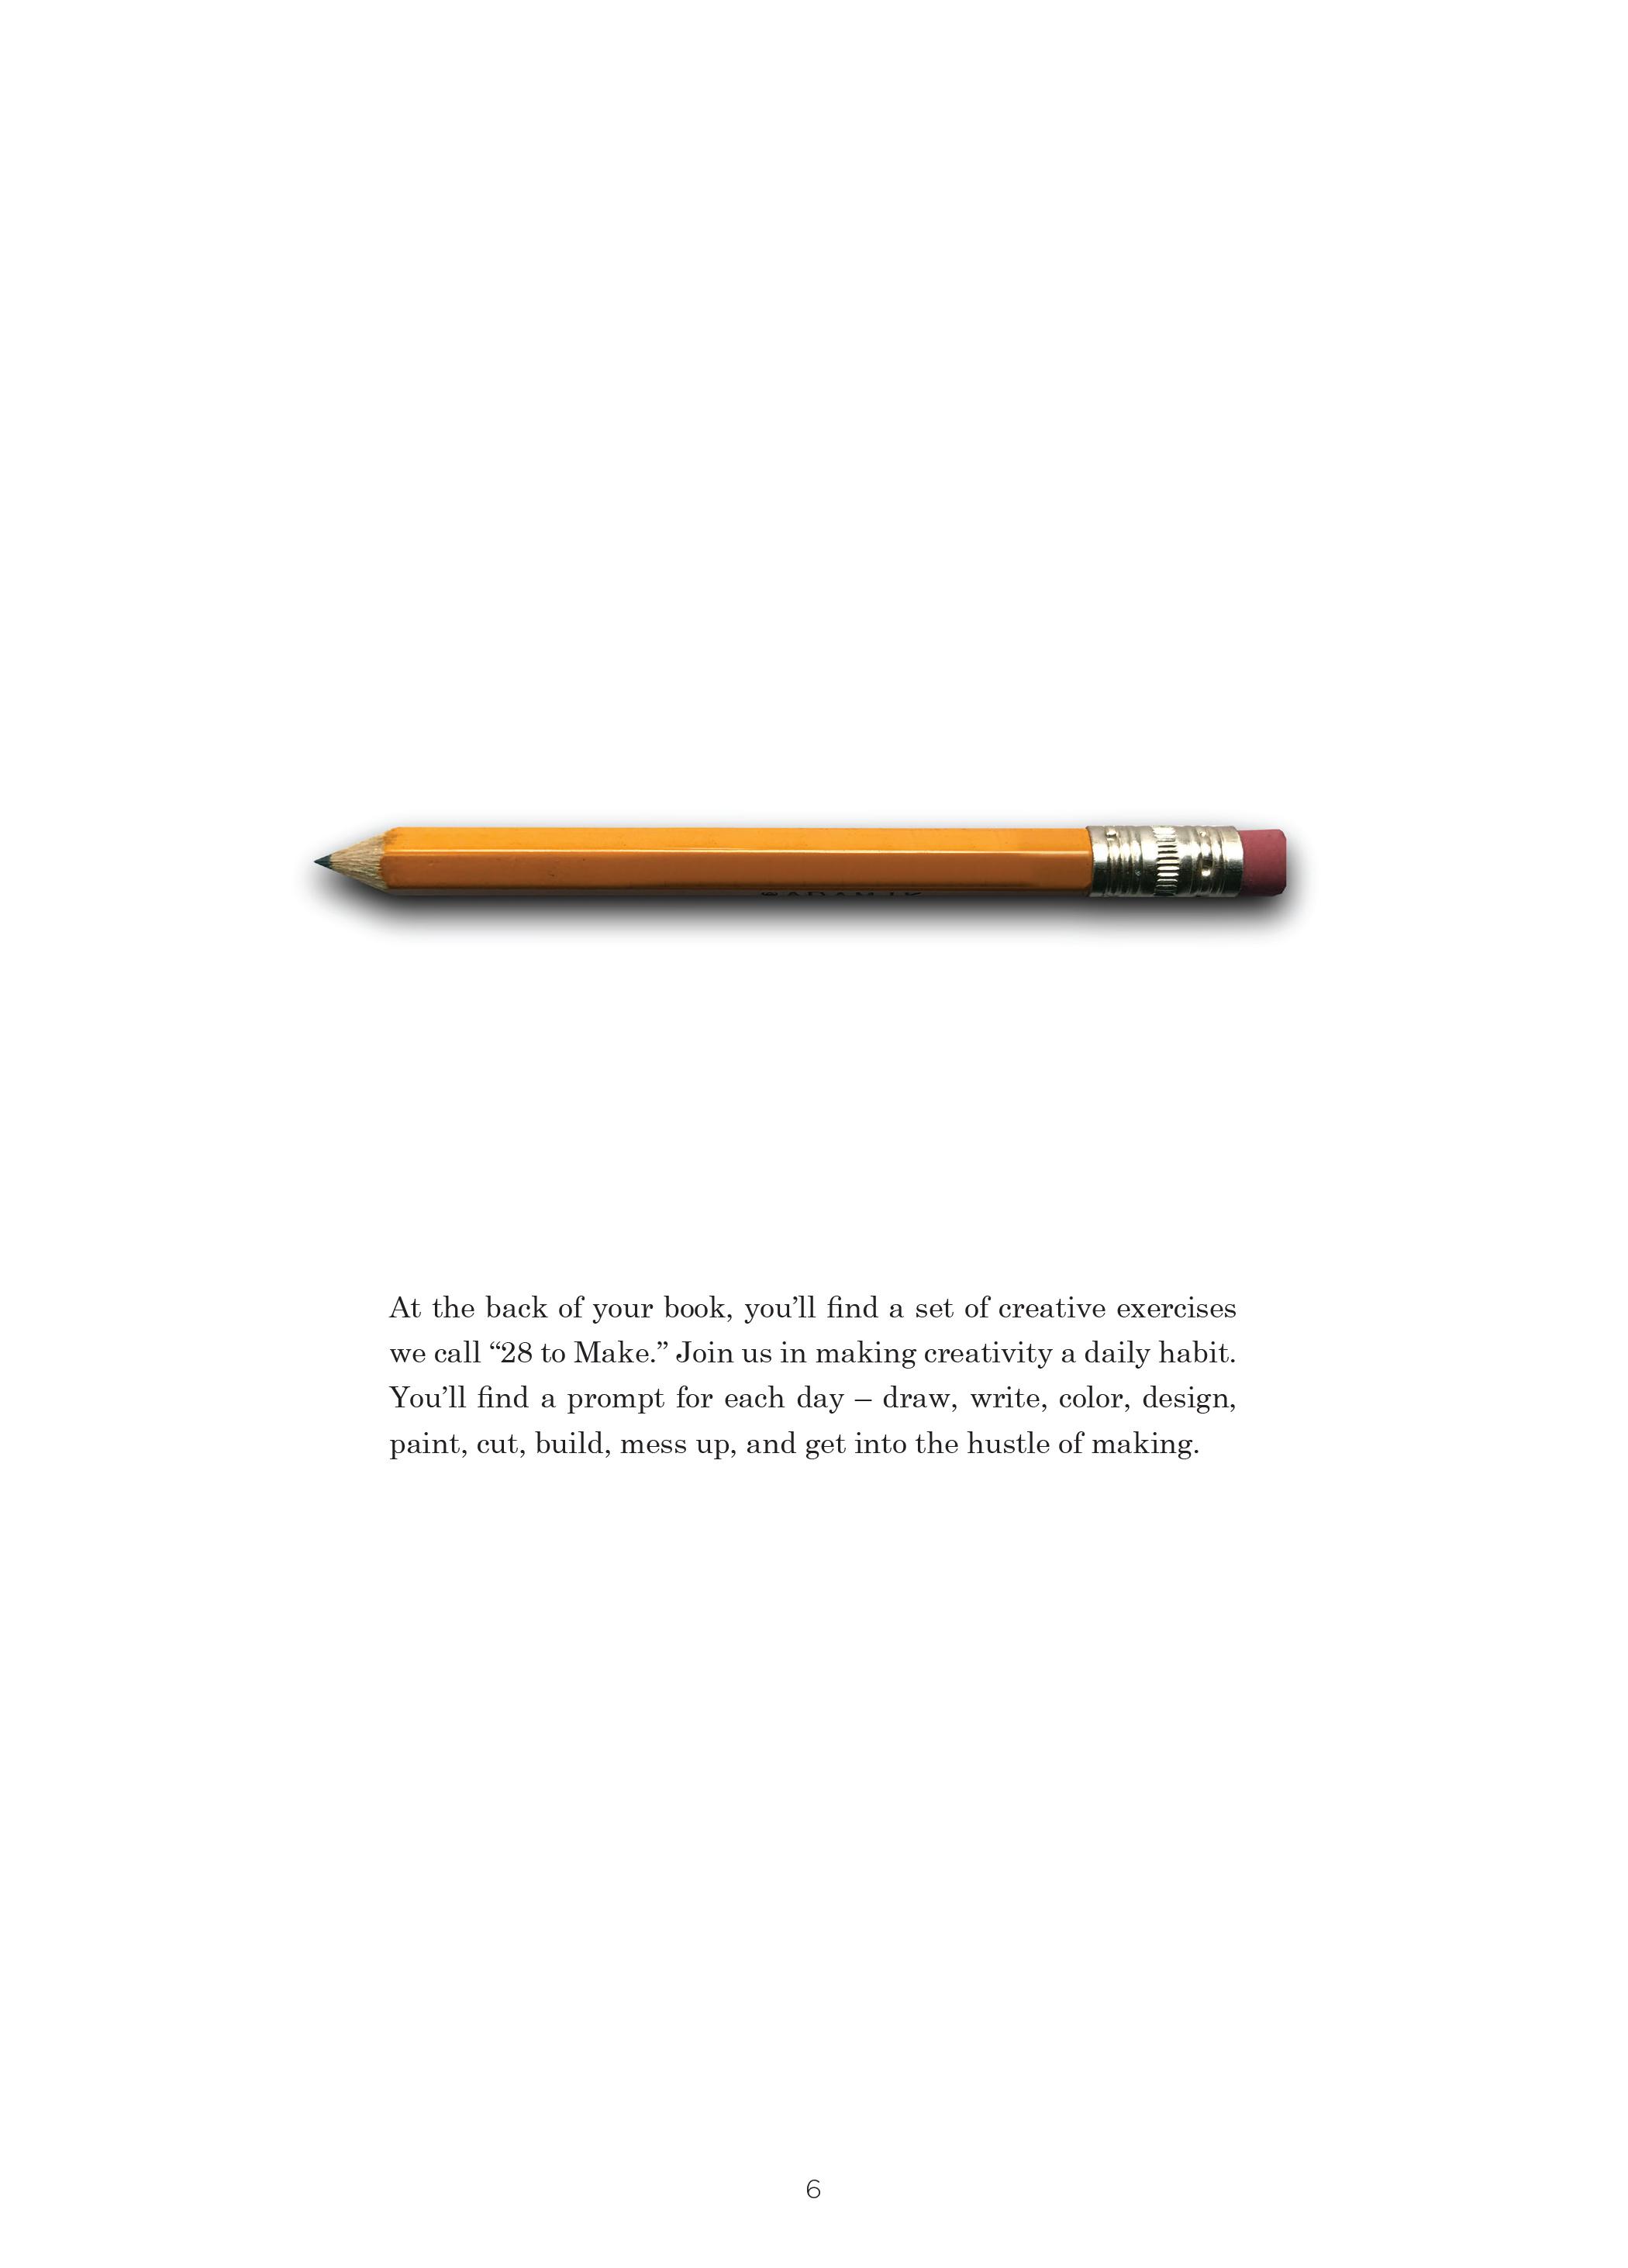 BRANDBOOK_2017_0808-6_pencil.jpg